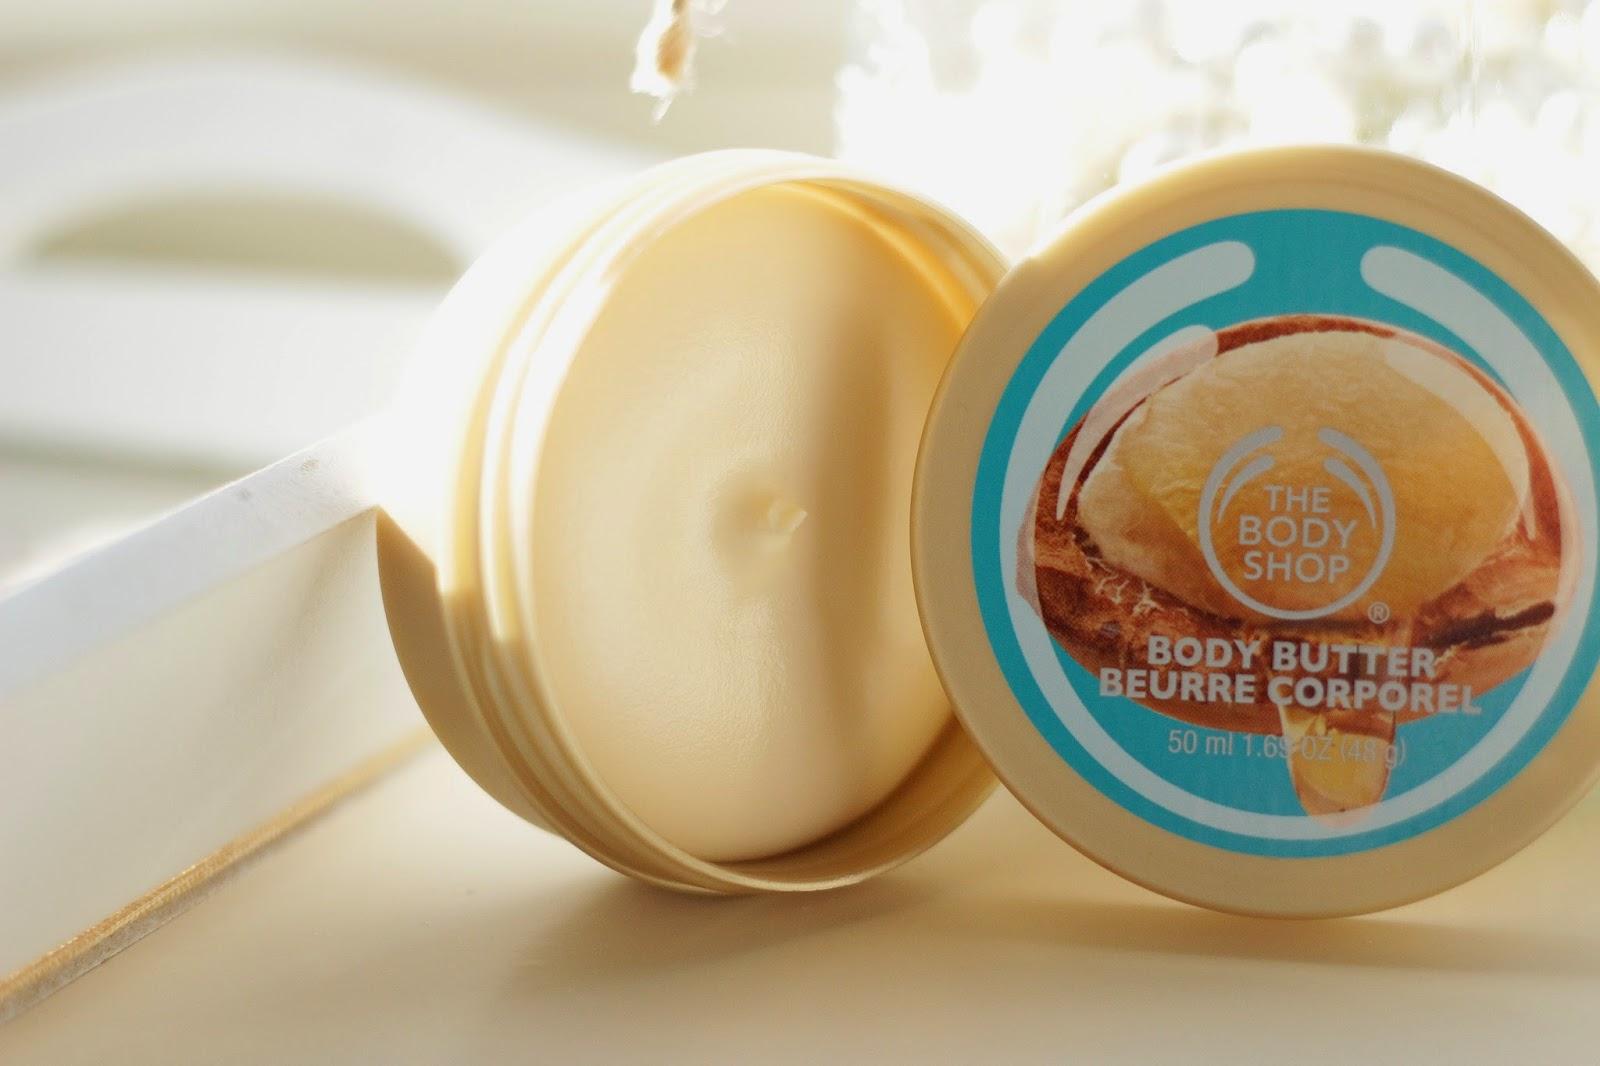 review the body shop wild argan oil body butter